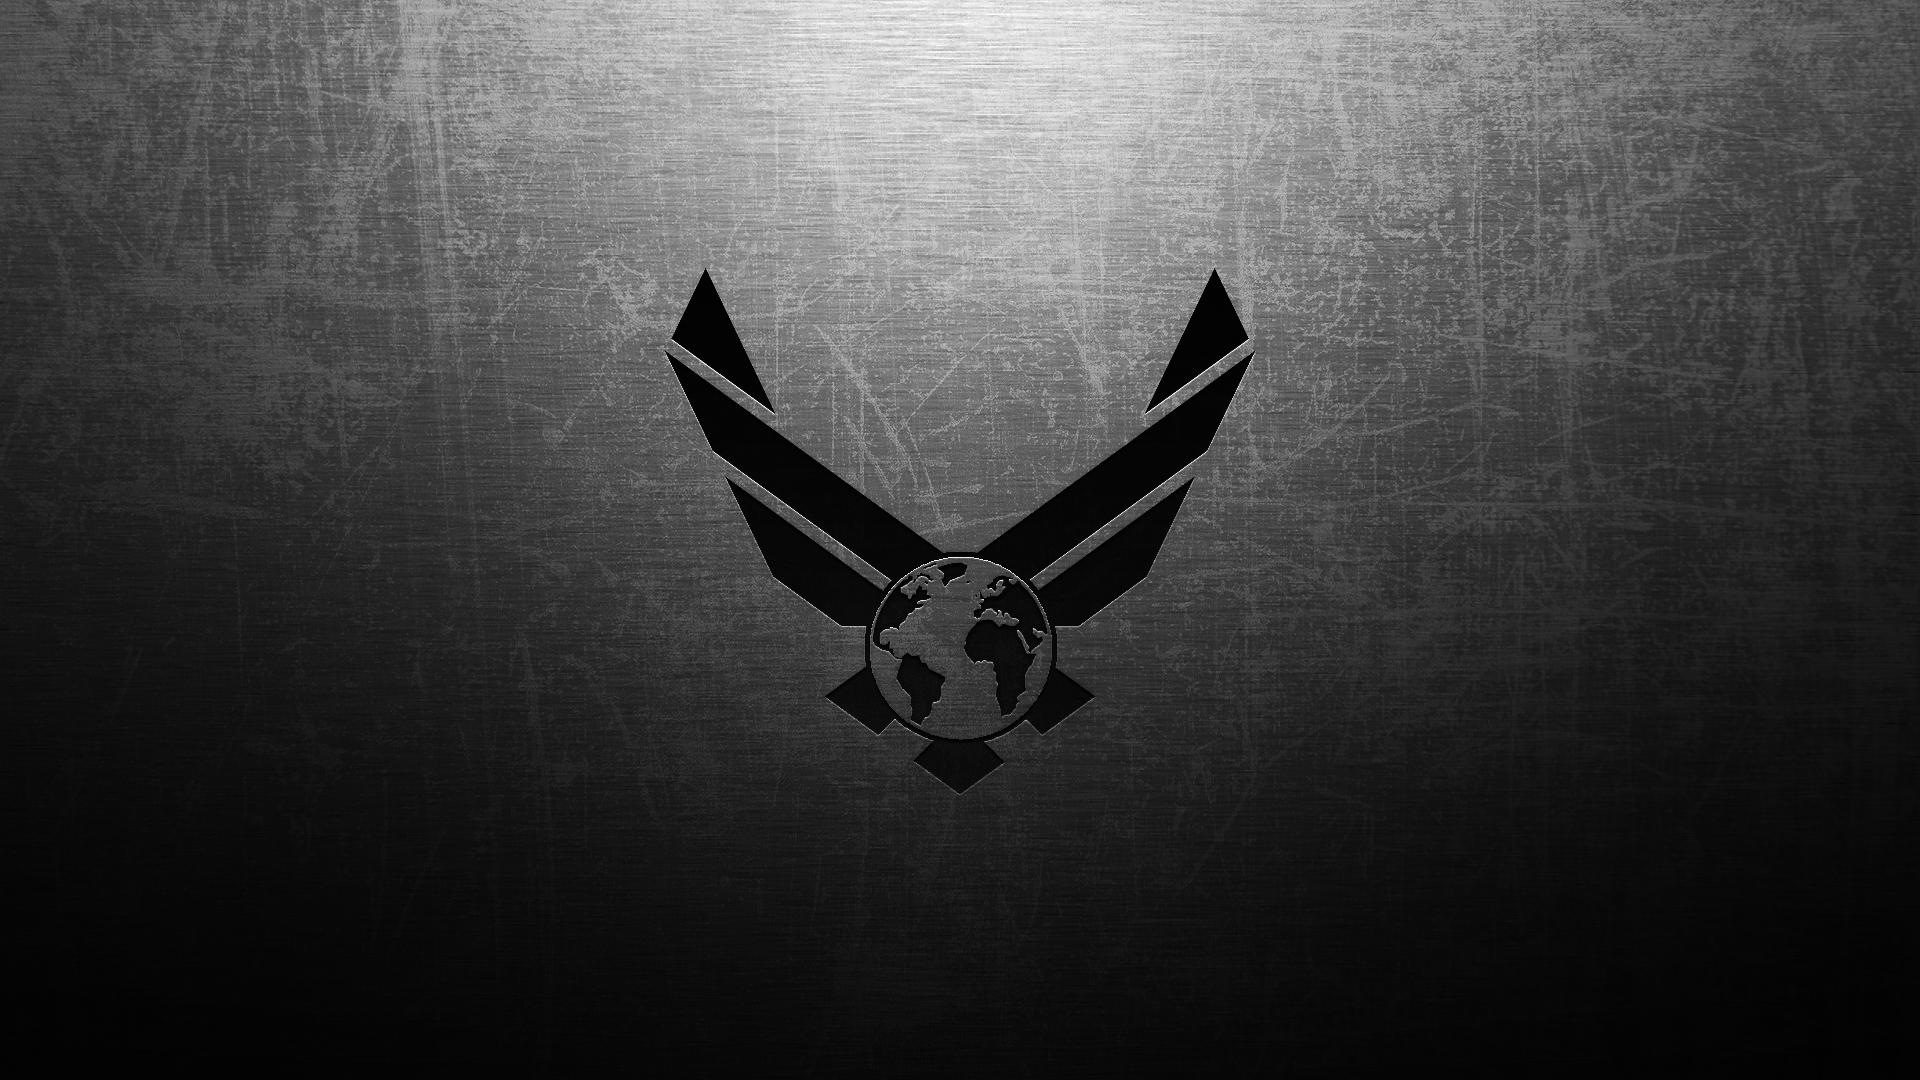 Us Air Force Logo wallpaper - 1274592